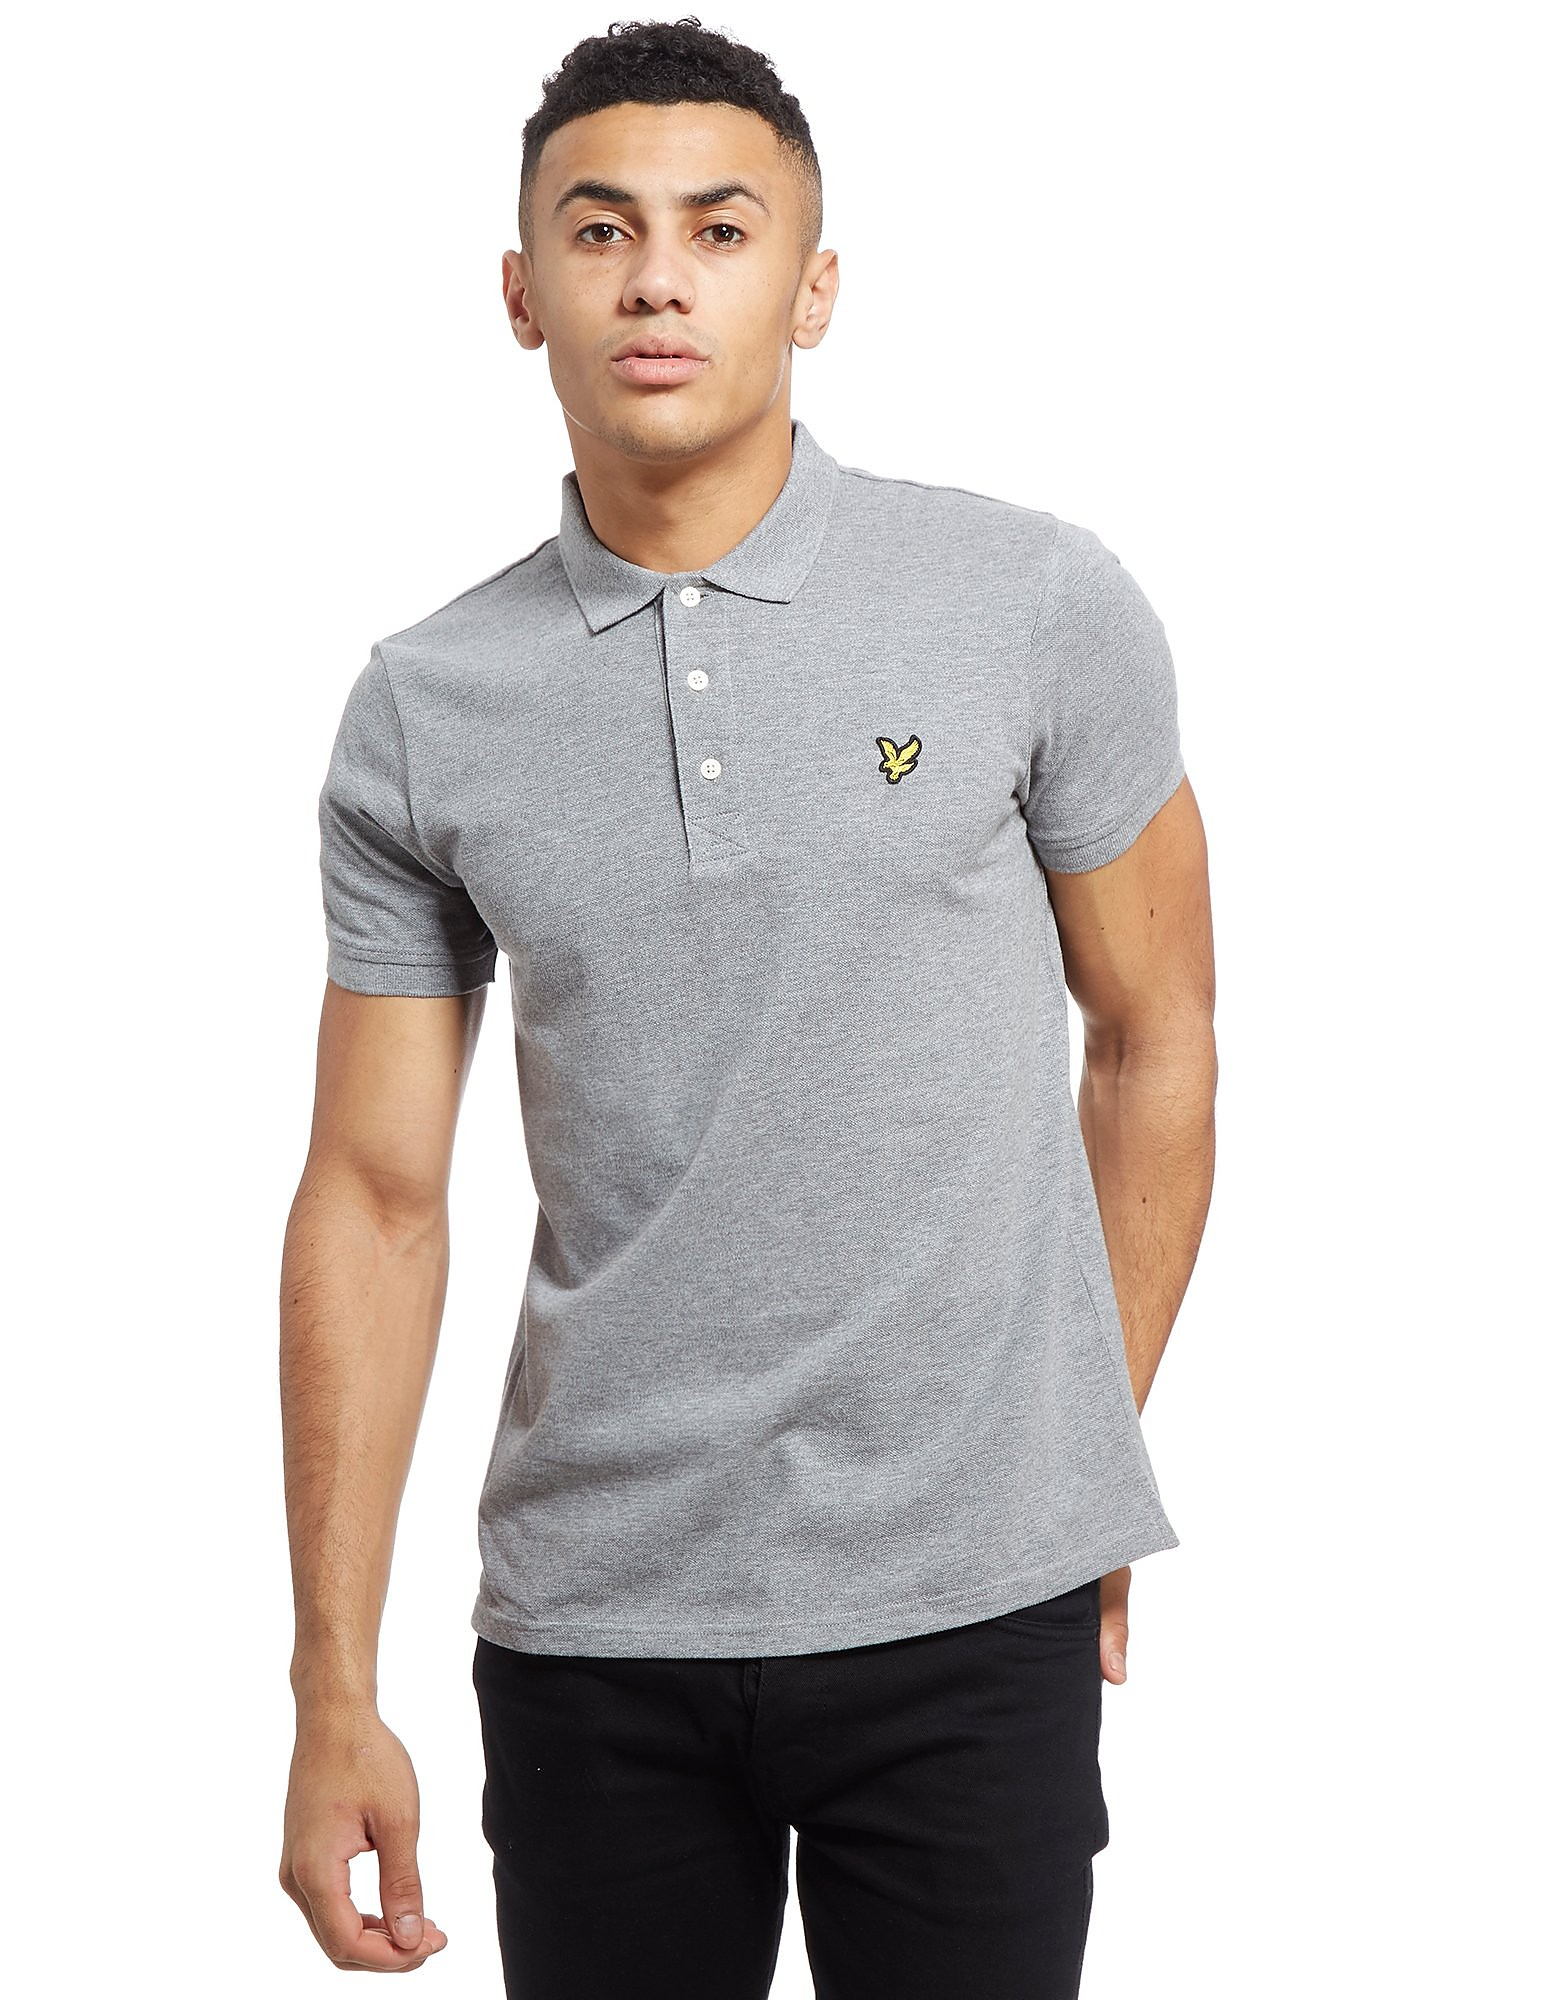 Lyle & Scott Core Short Sleeve Polo Shirt